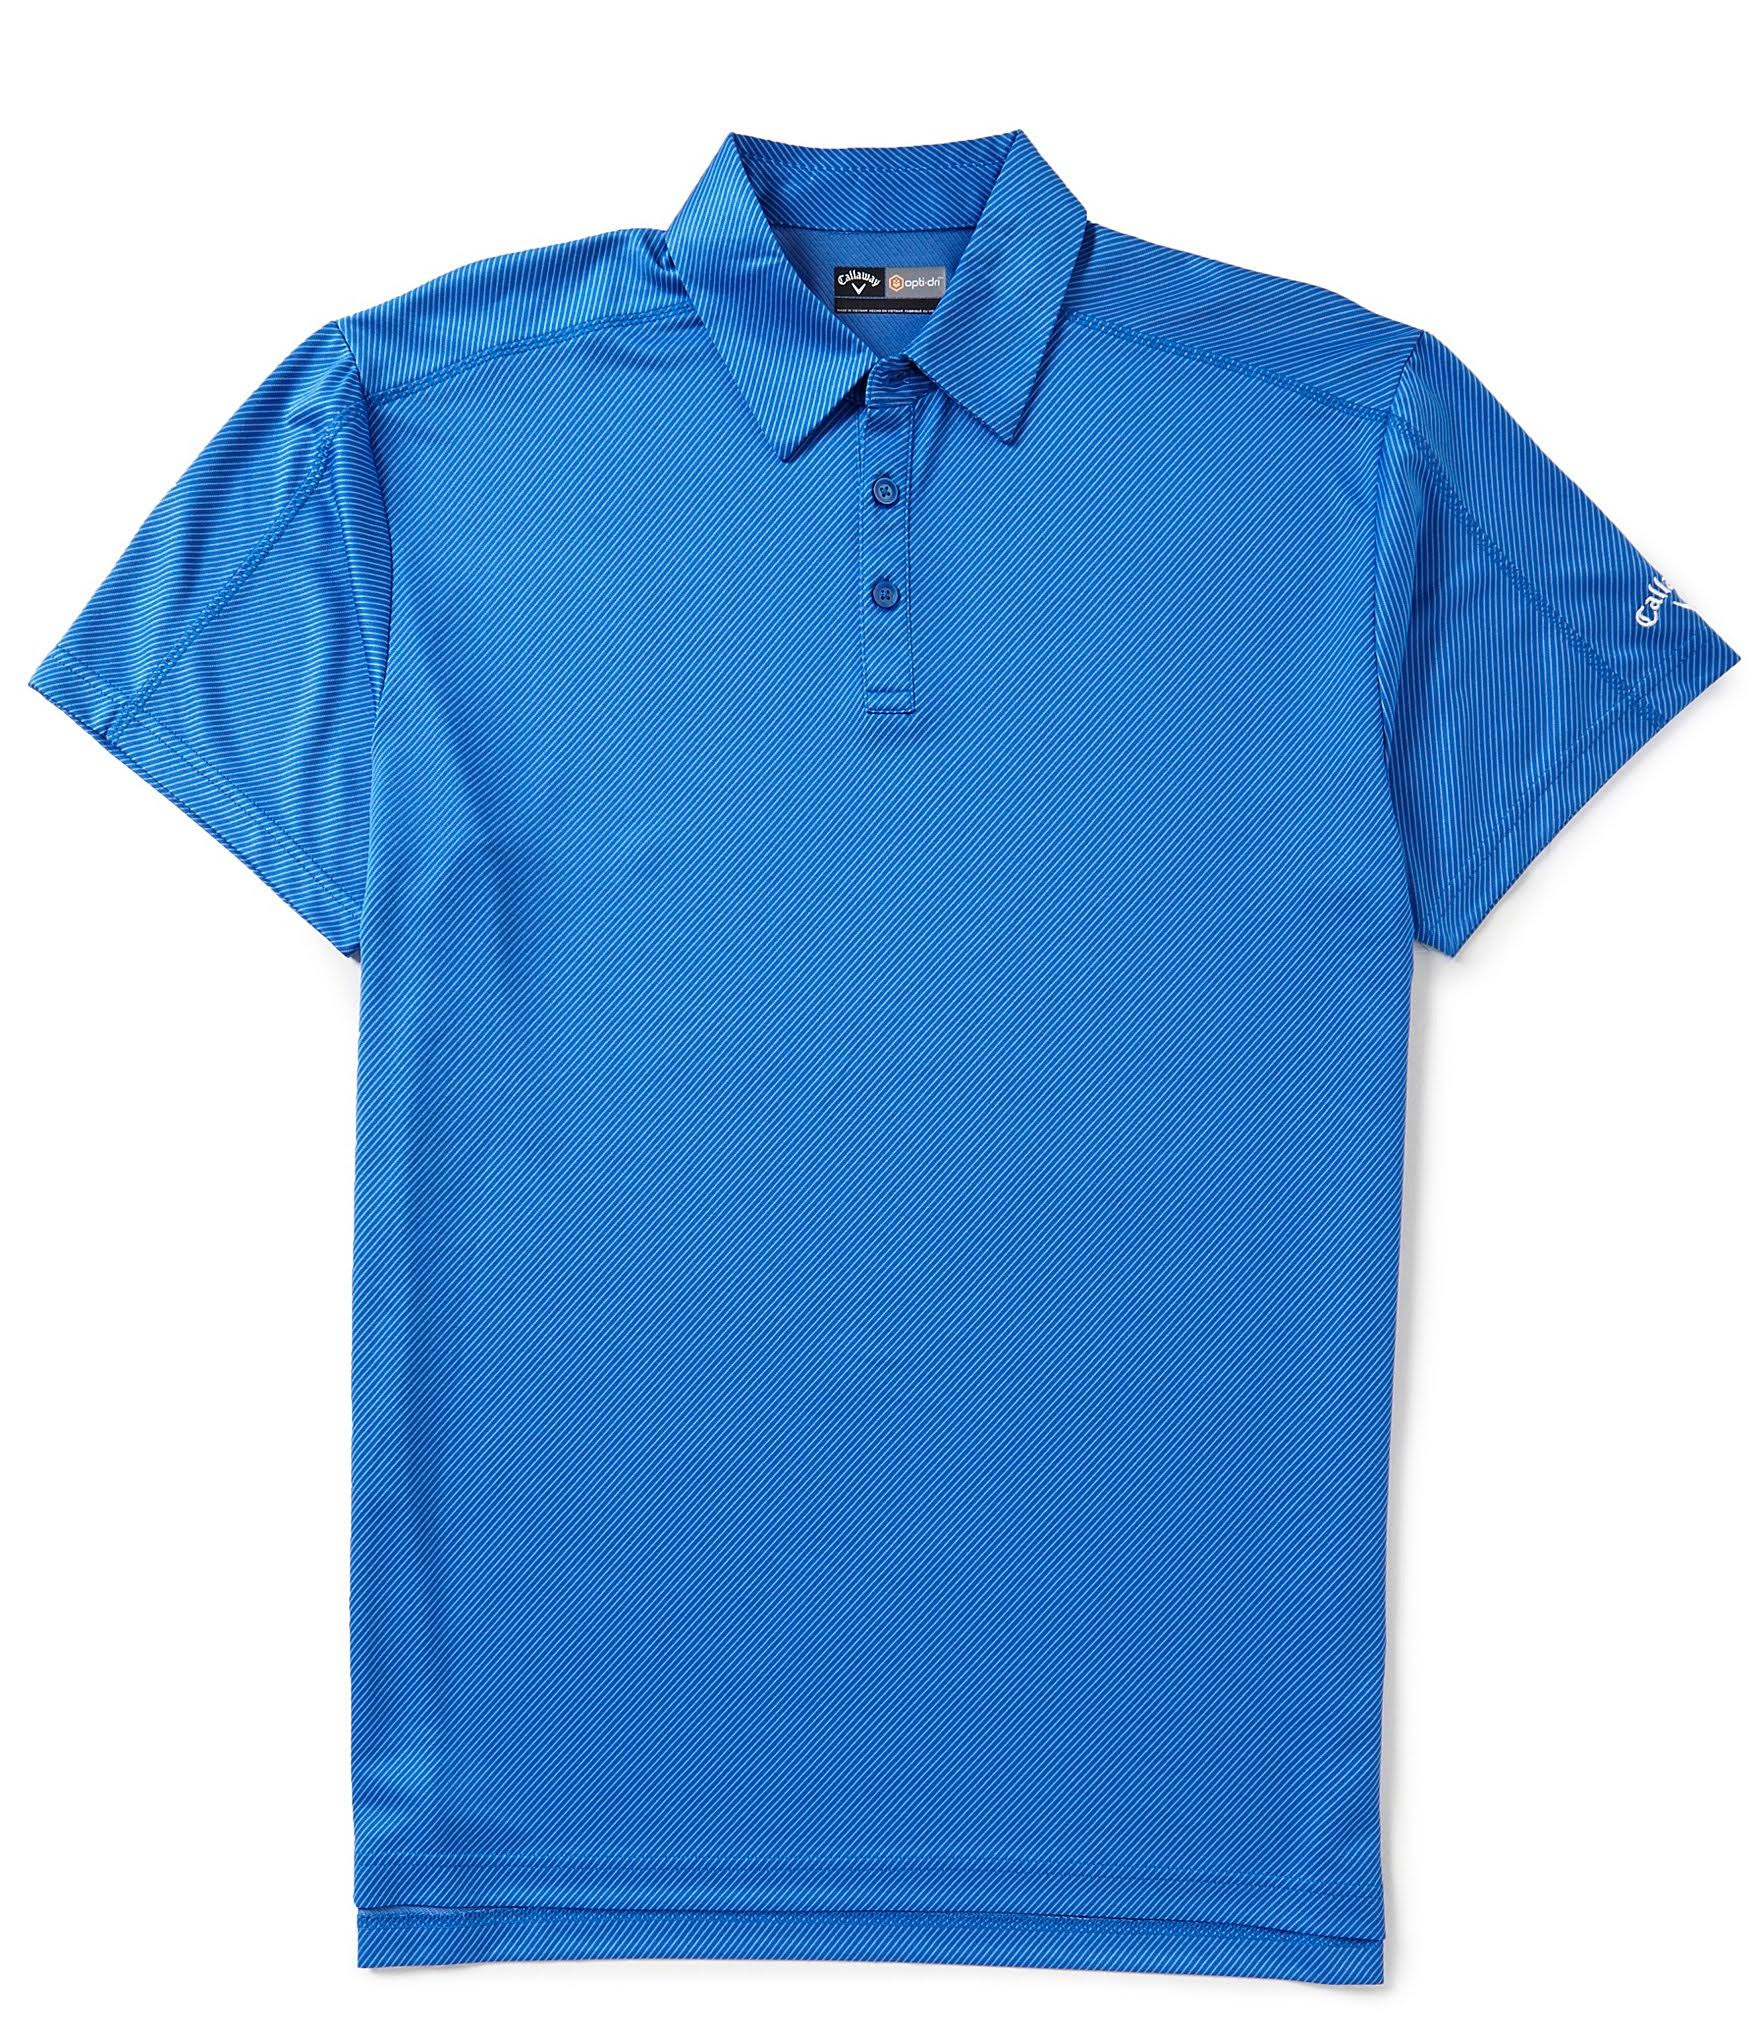 Callaway Para Tall Polo Jacquard De Hombre azul Magnético Denim Big amp; 3x wq88YFZX